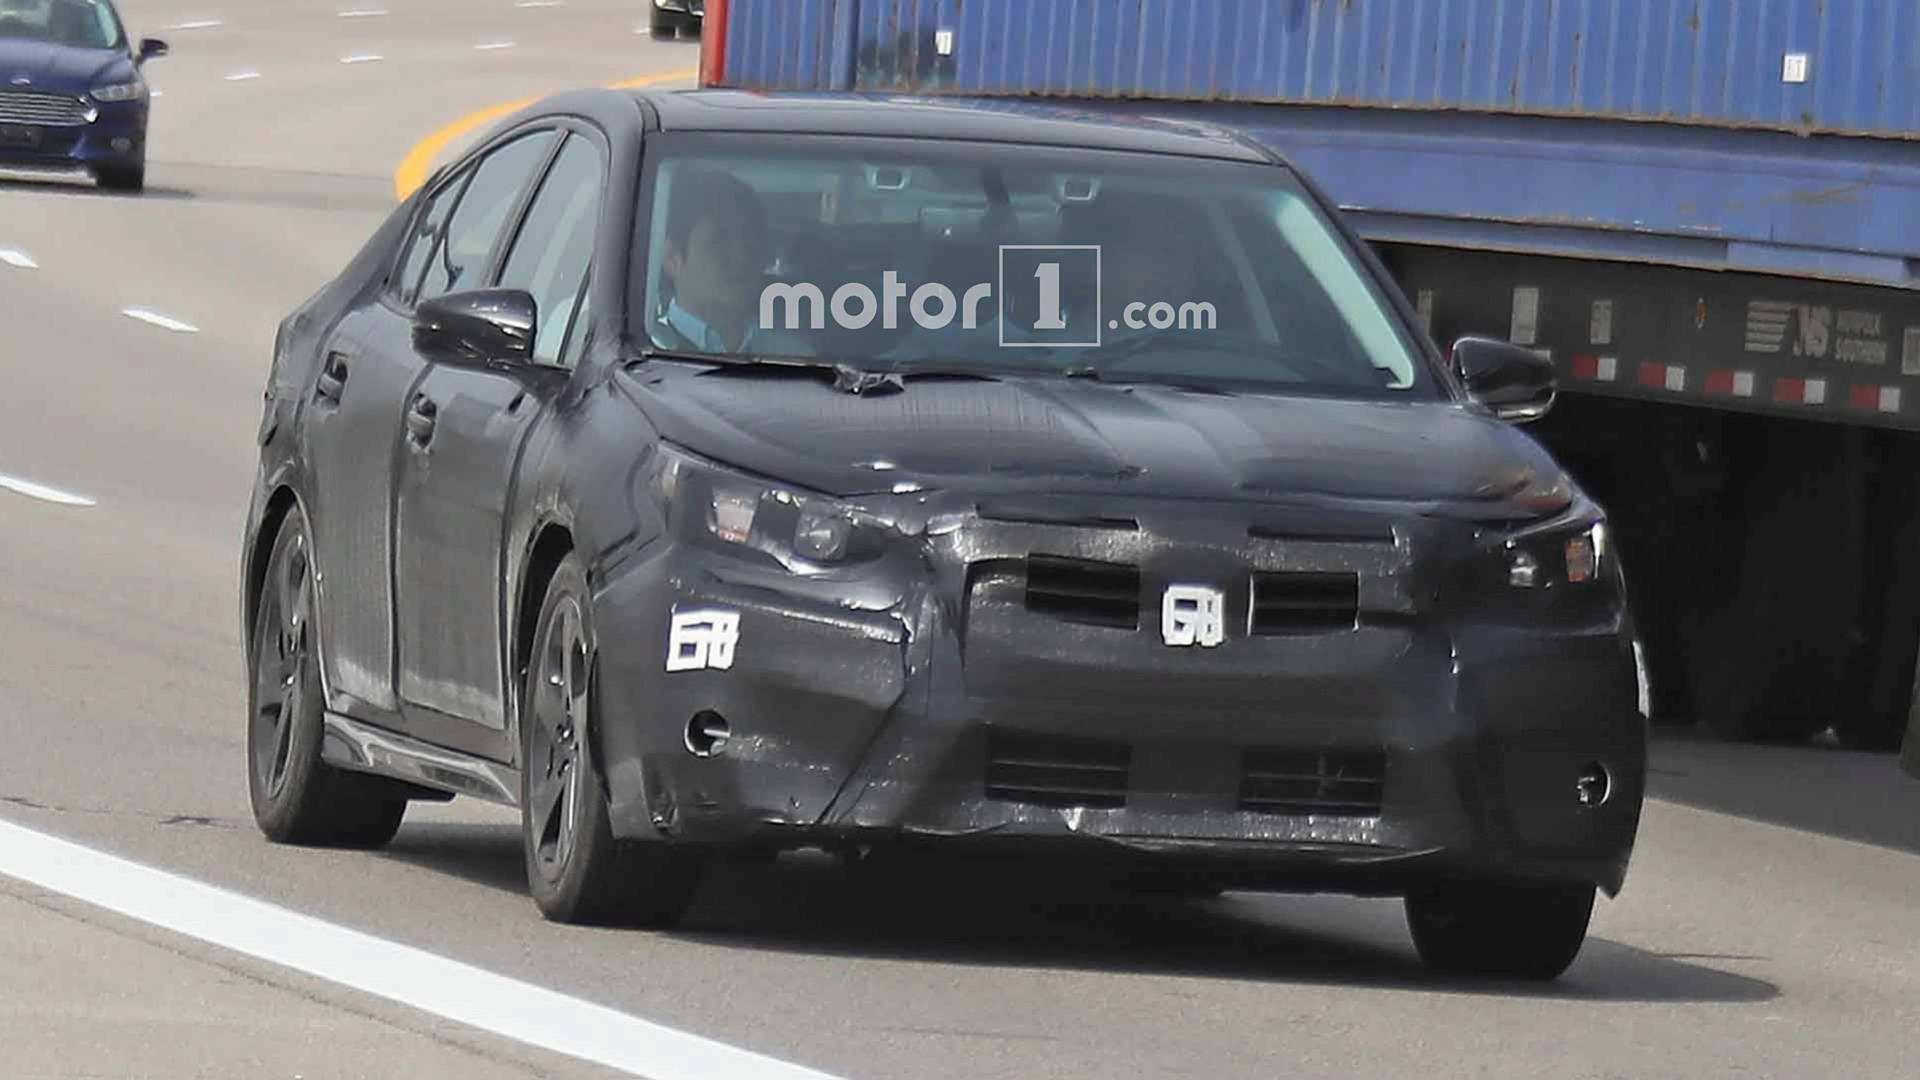 62 Concept of The Subaru Global Platform 2019 Spy Shoot Wallpaper by The Subaru Global Platform 2019 Spy Shoot